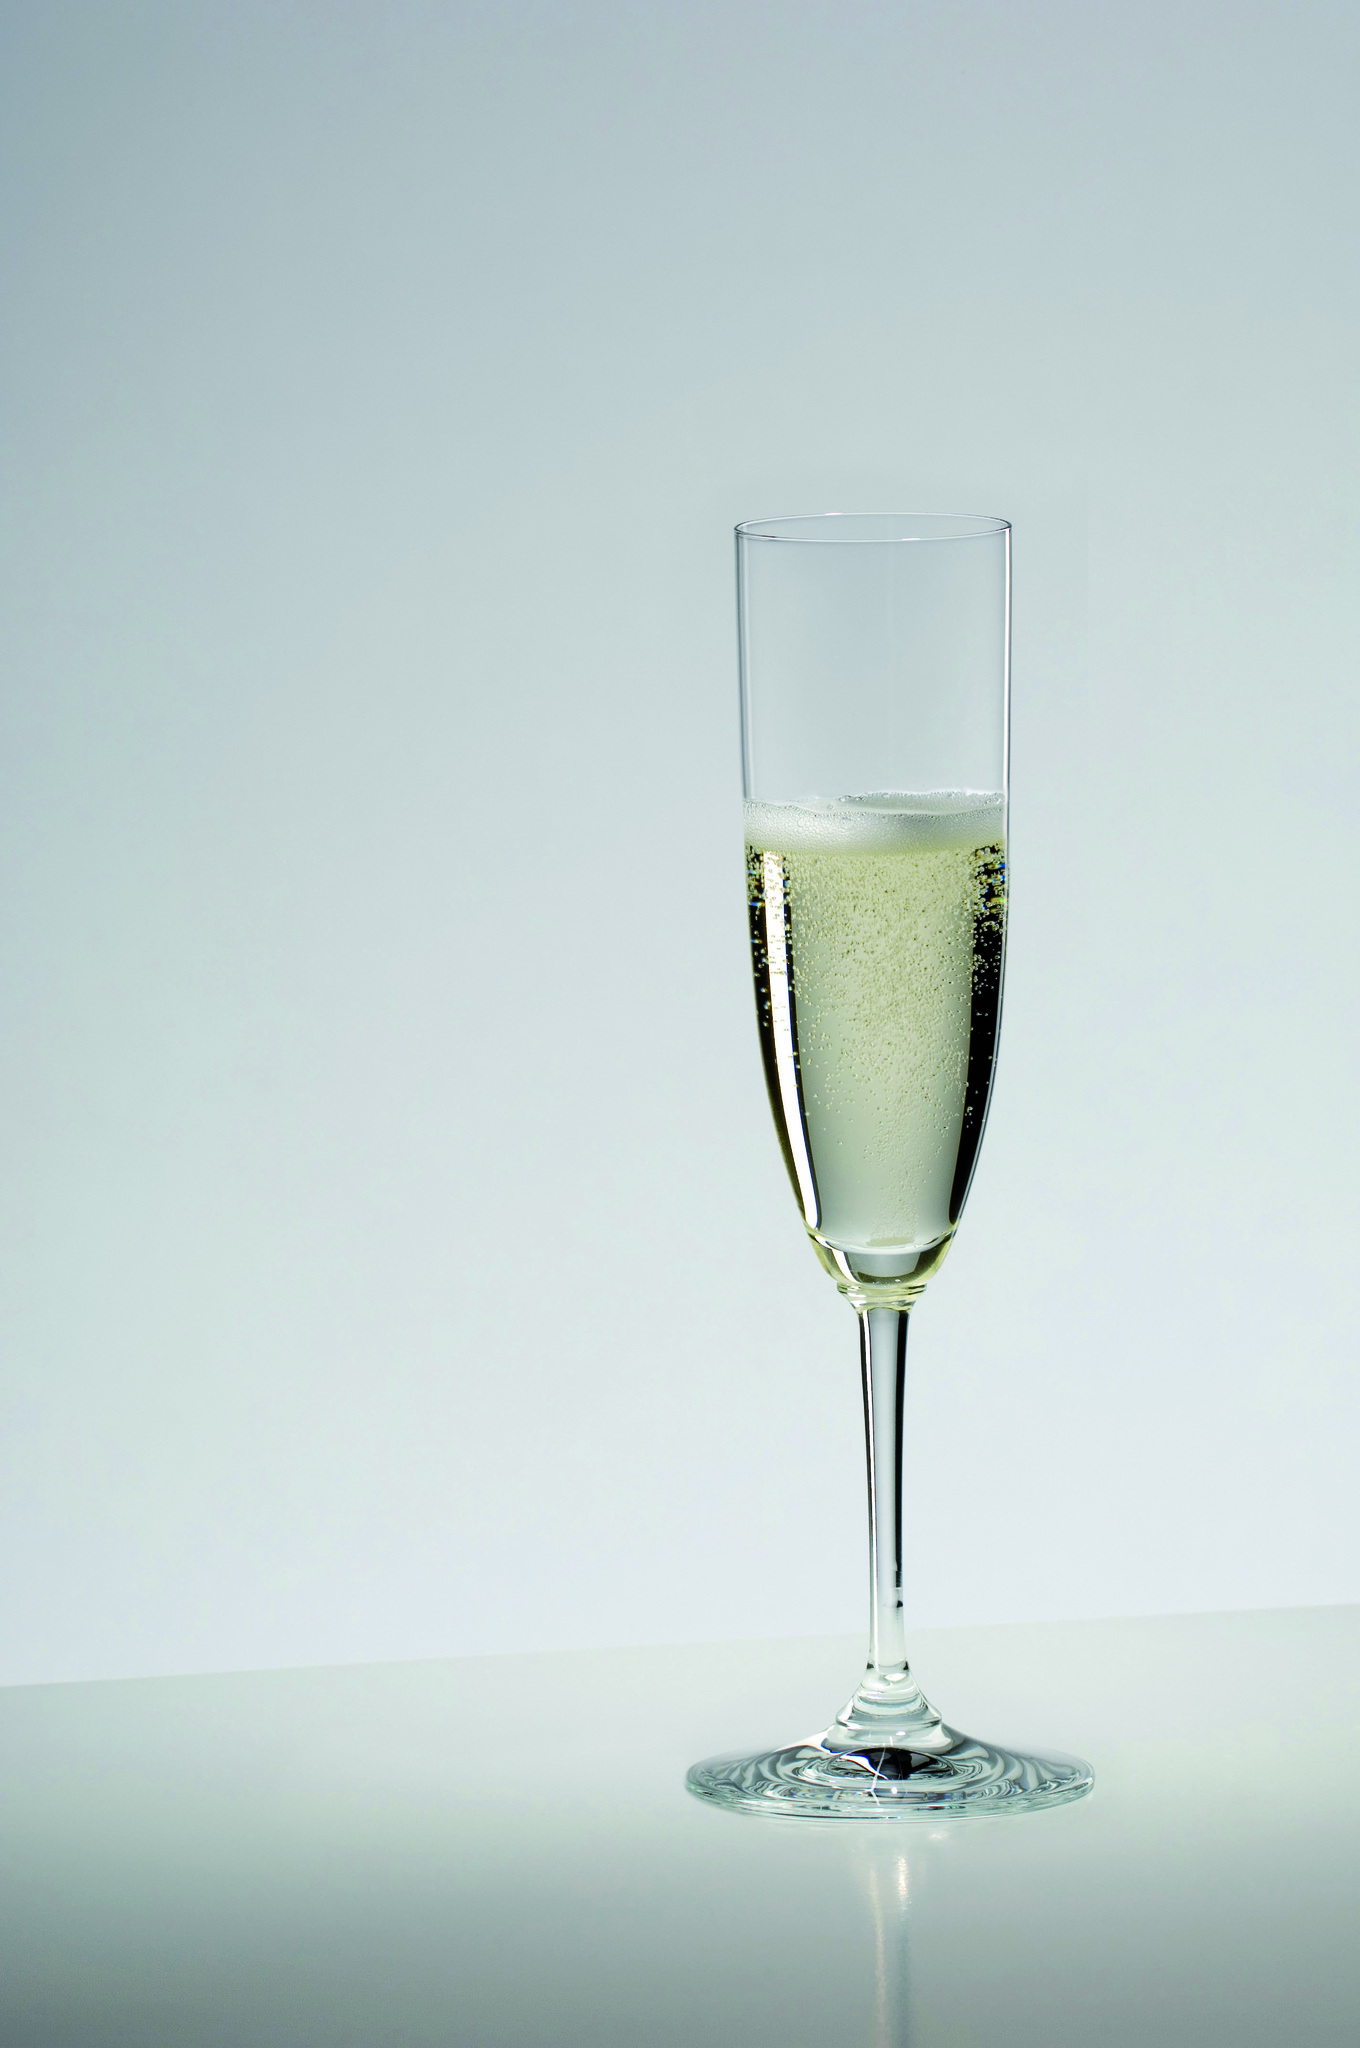 Бокалы Набор бокалов для шампанского 2шт 160мл Riedel Vinum Champagne Glass nabor-bokalov-dlya-shampanskogo-2-sht-160-ml-riedel-vinum-champagne-glass-avstriya.jpg